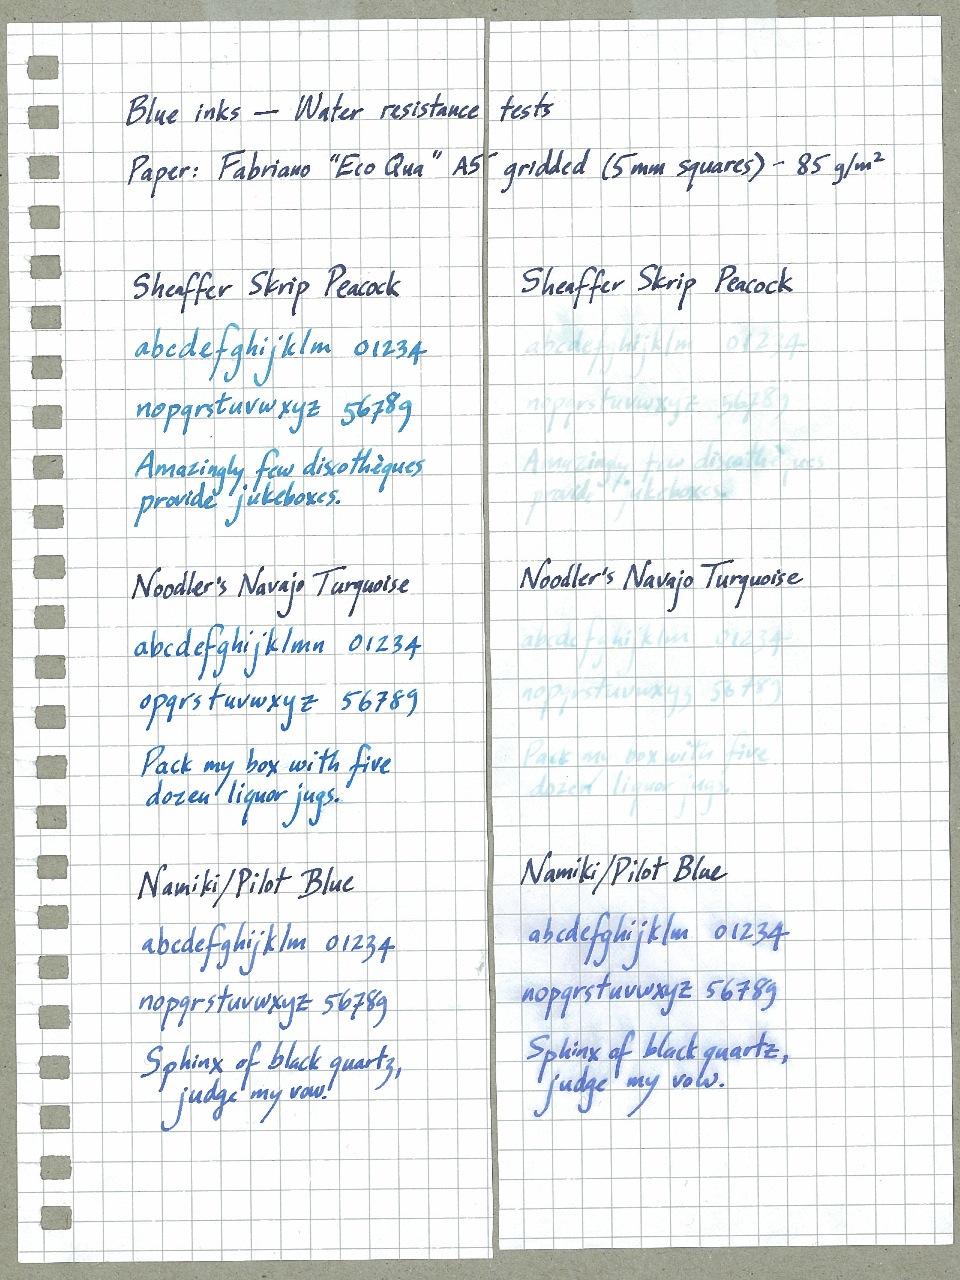 Blue Inks Water Resistance Tests -- 15 Inks - Ink